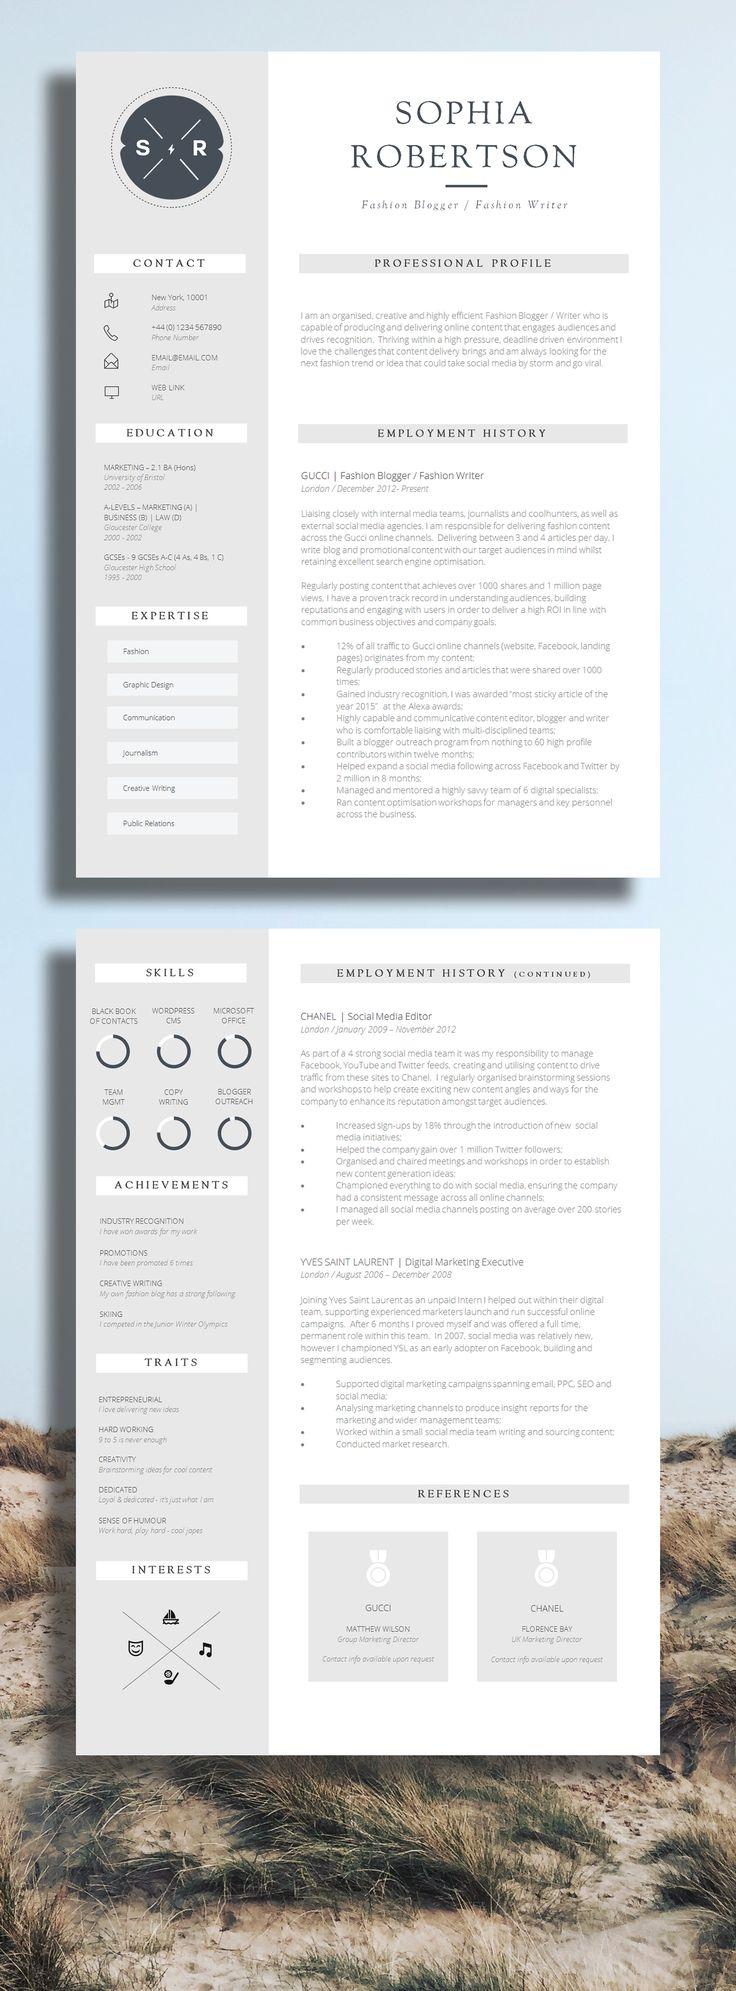 Resume infographic : Creative Resume Template | Teacher